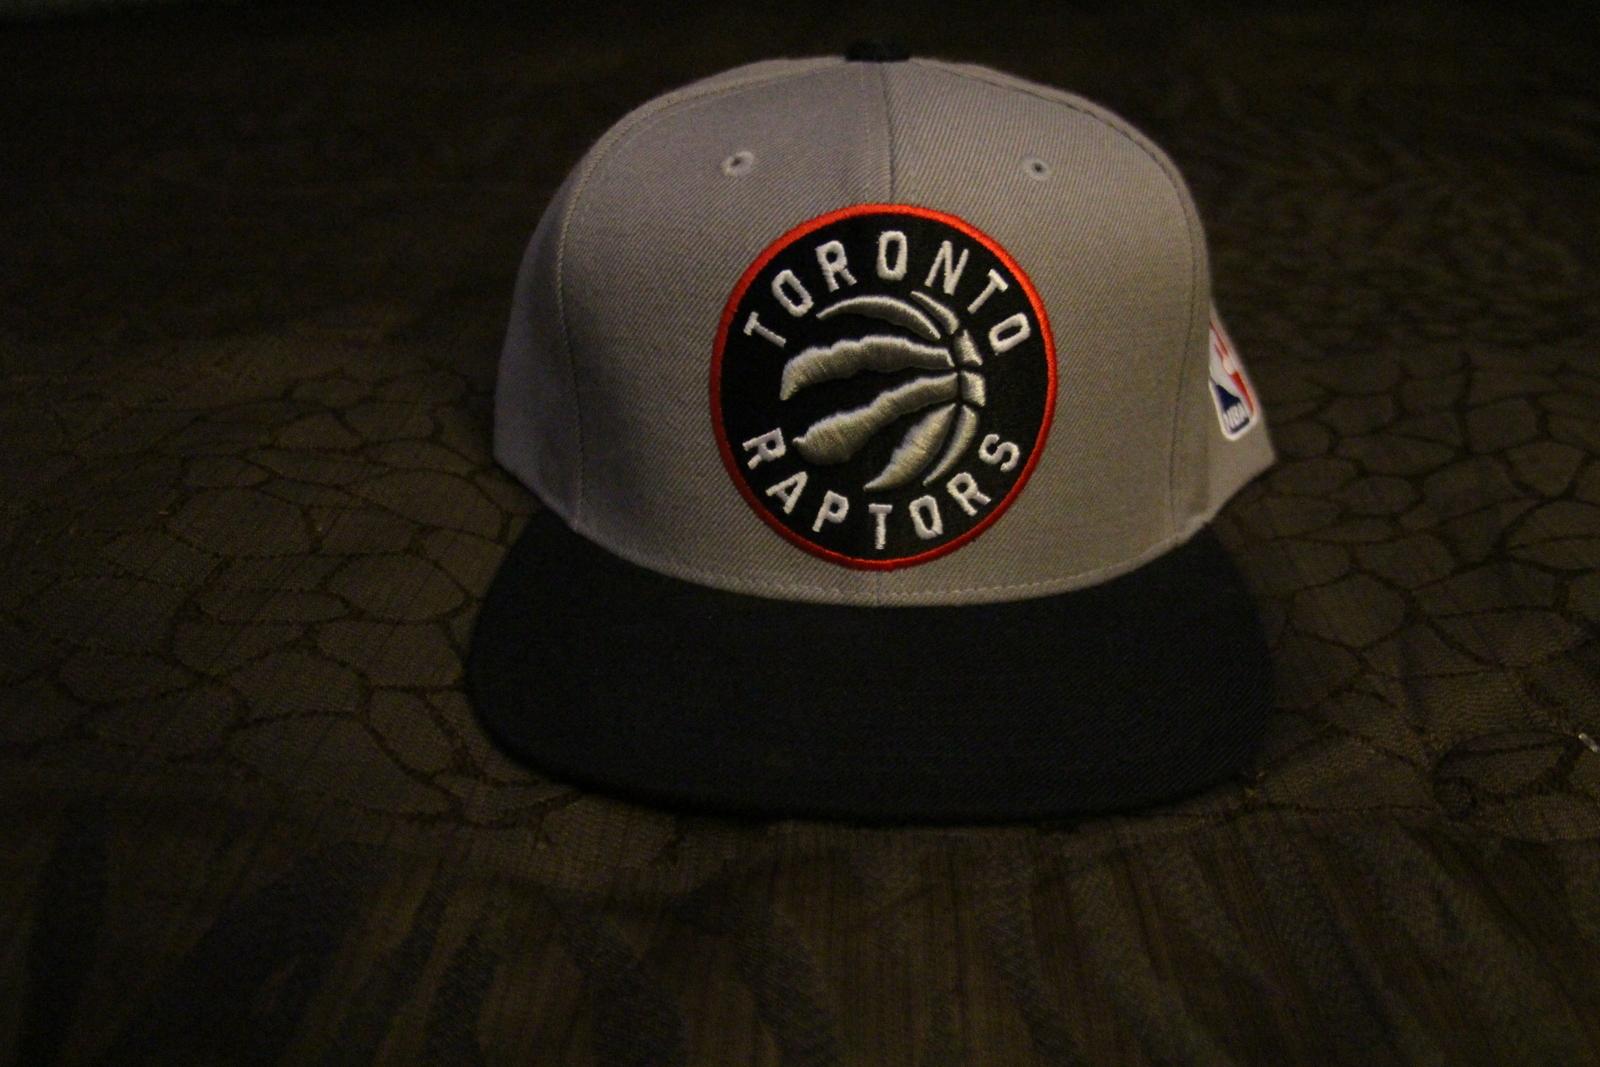 online store 1f4b5 1eb00 Img 5572. Img 5572. Previous. Mitchell   Ness - Hardwood Classic - Snapback  Hat - Toronto Raptors · Mitchell ...